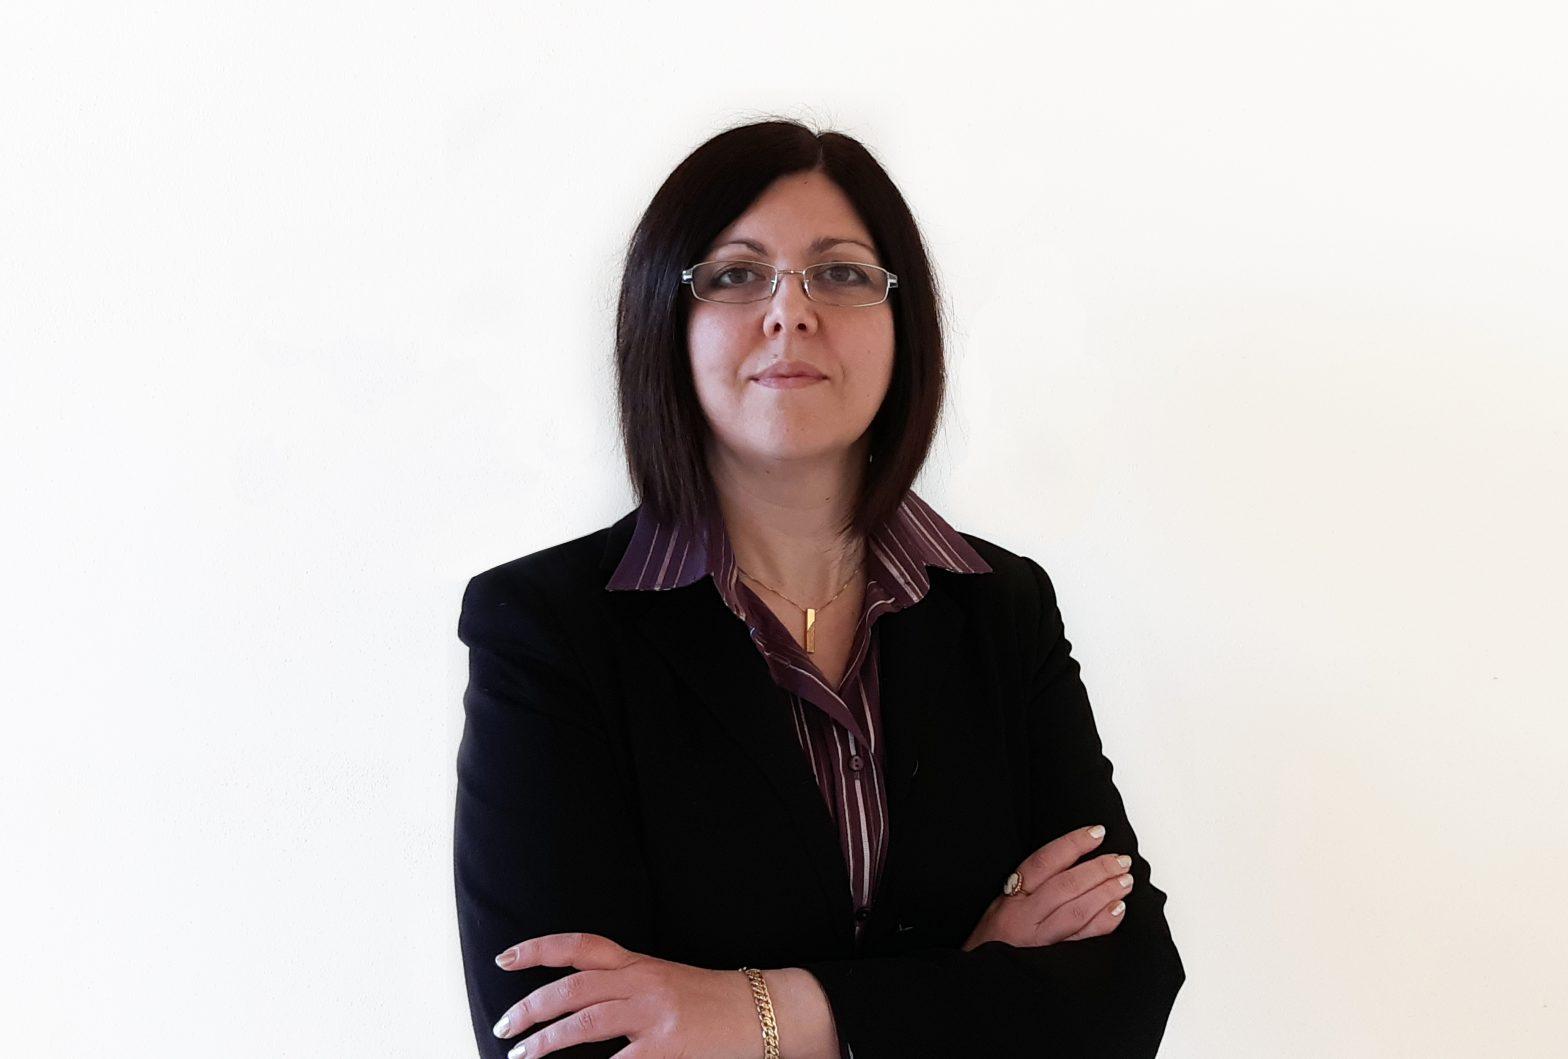 Patrizia Pincin